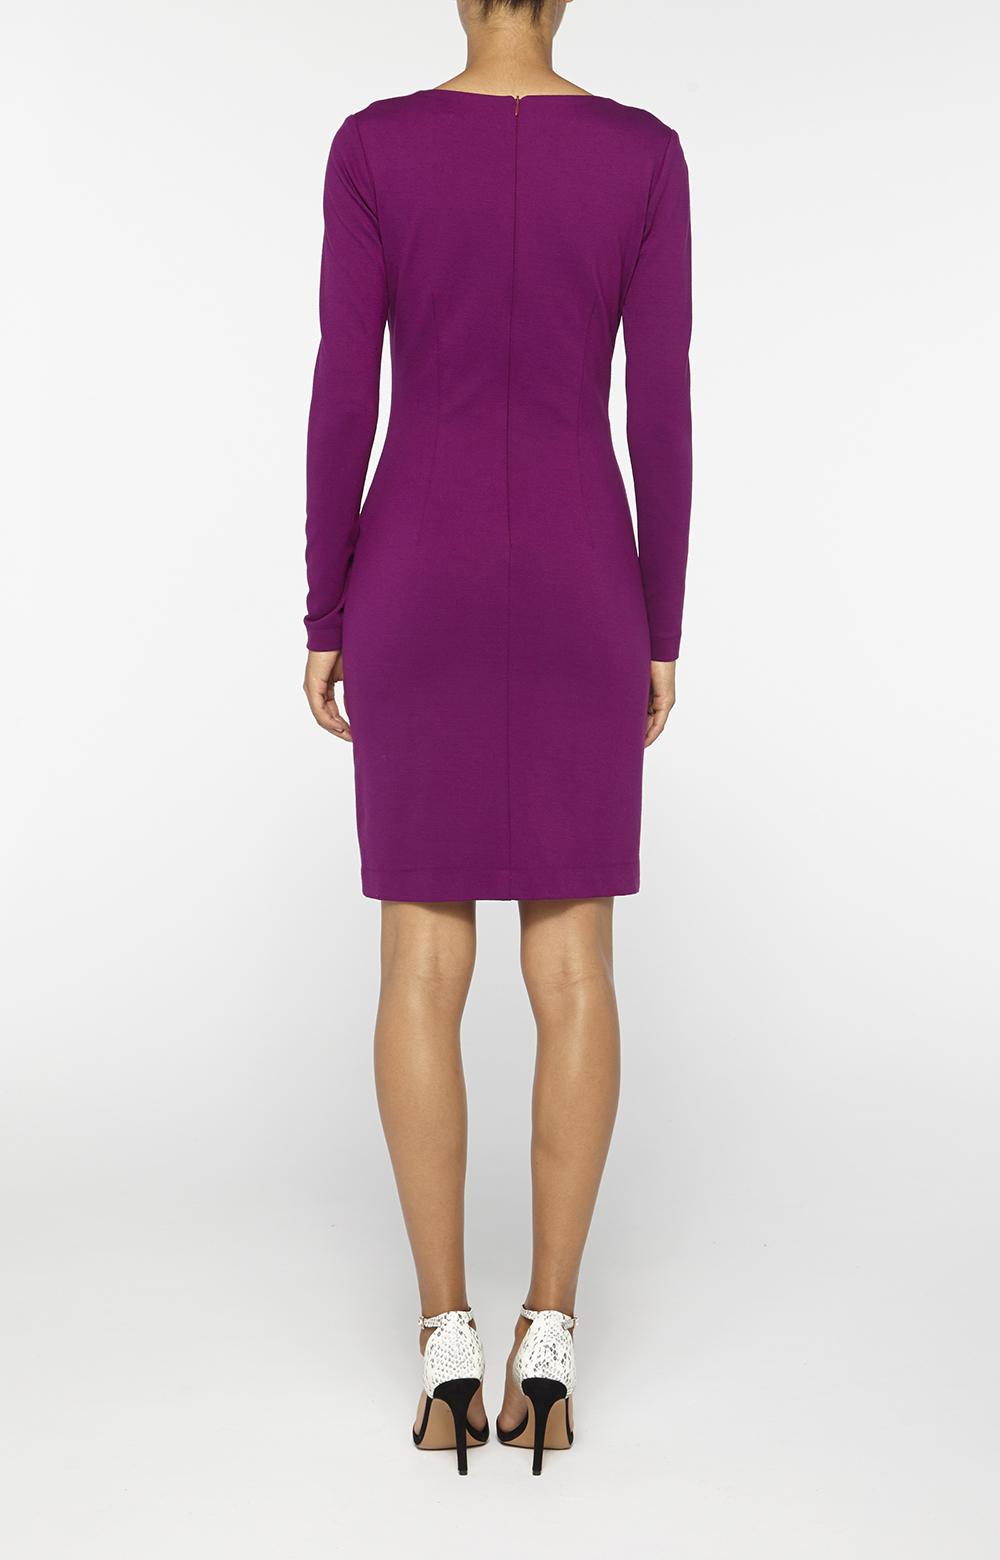 Nicole Miller V Neck Zipper Dress In Purple Byzantium Lyst